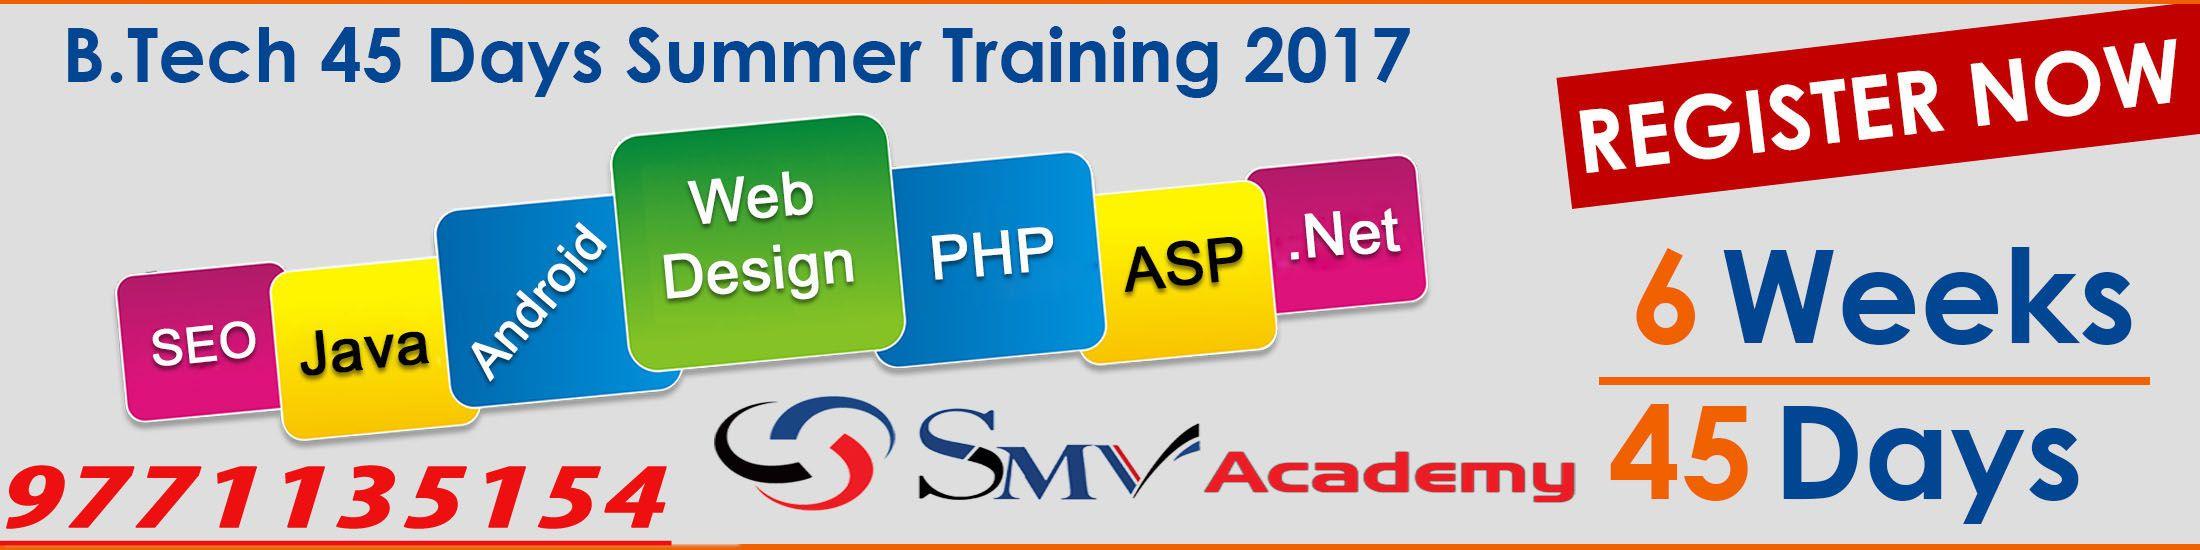 SMV Academy offers Summer training in patna bihar,PHP,java